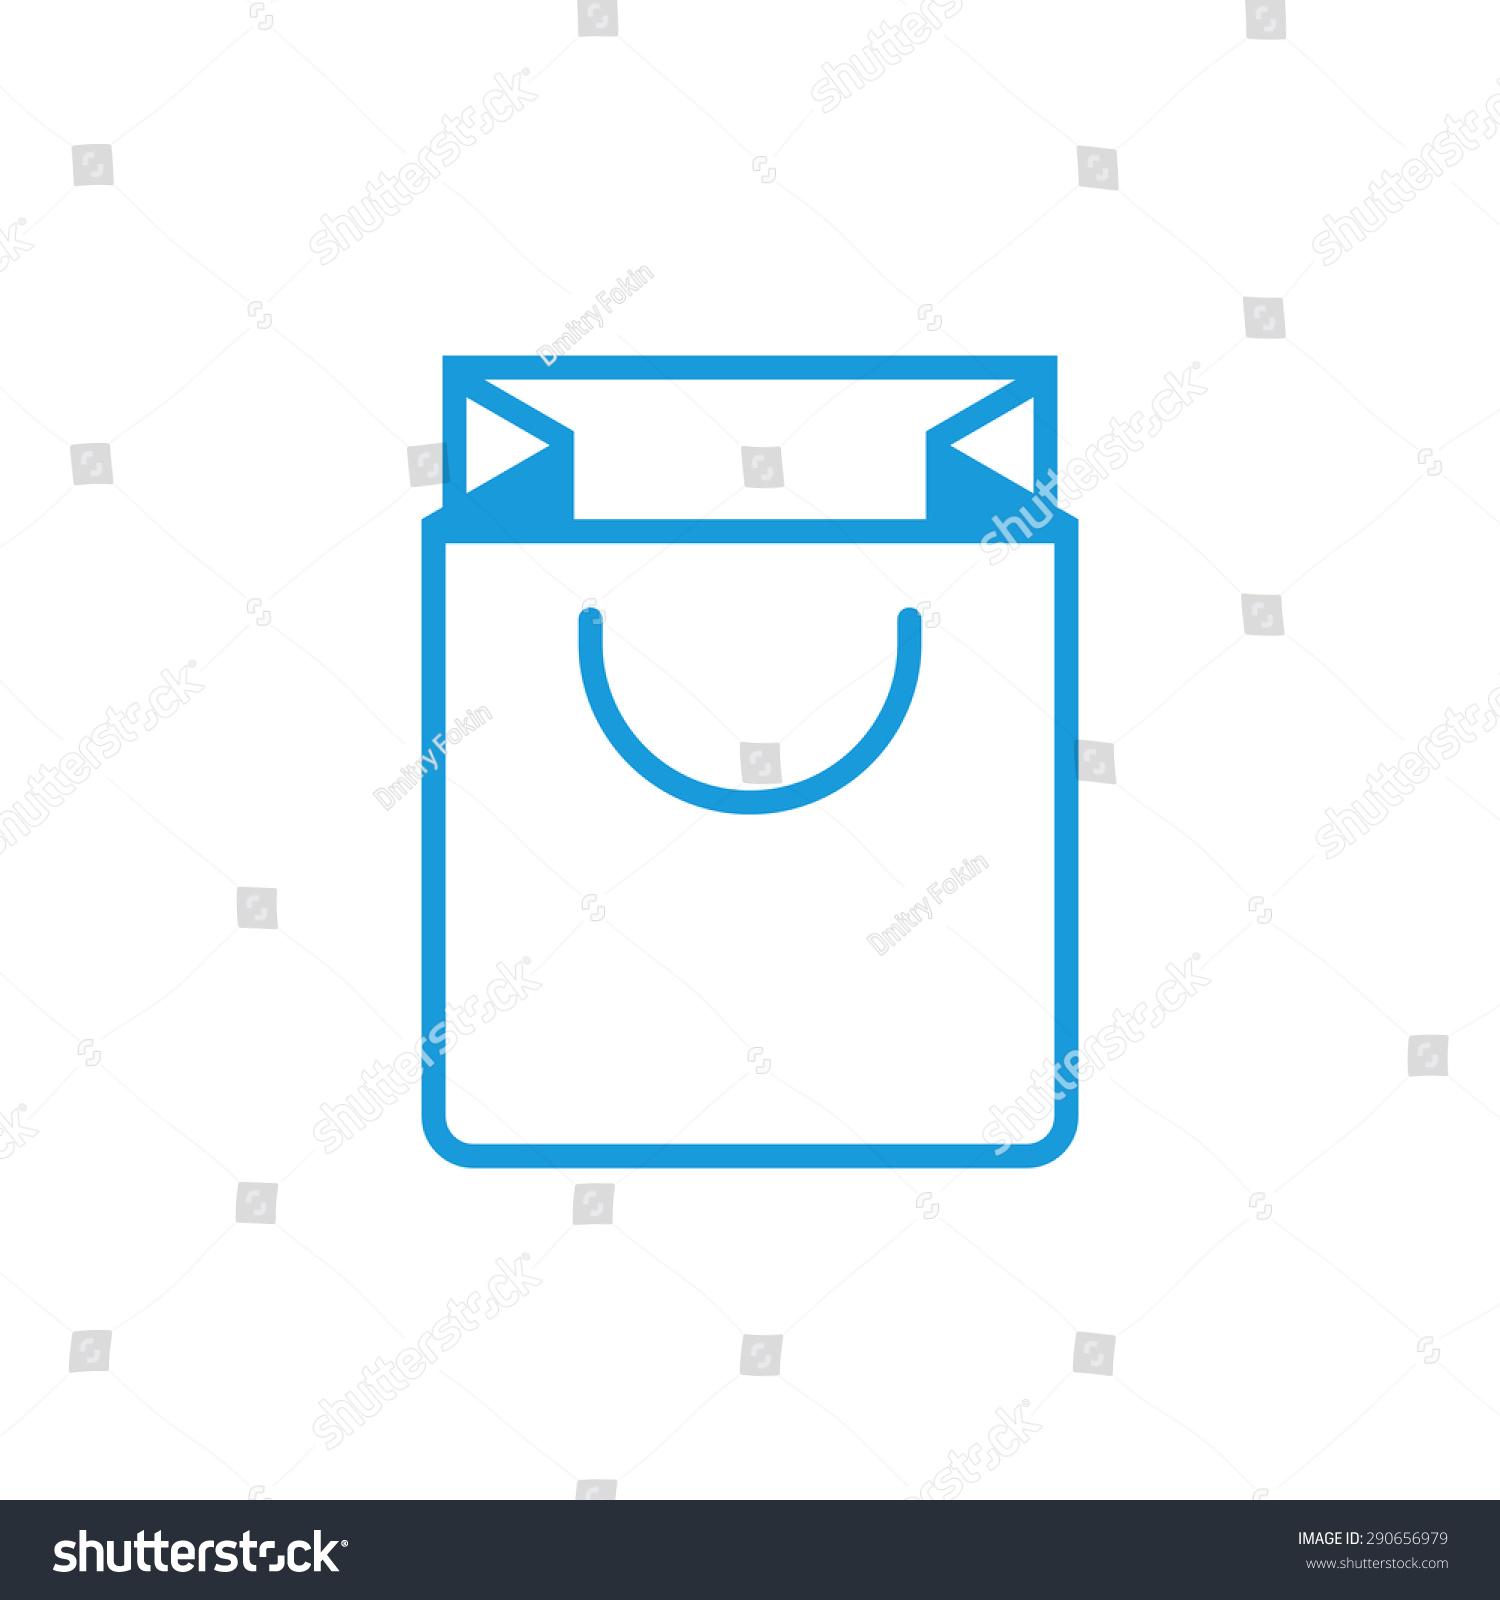 Paper bag vector - Shopping Bag Outline Icon Modern Minimal Flat Design Style Paper Bag Vector Illustration